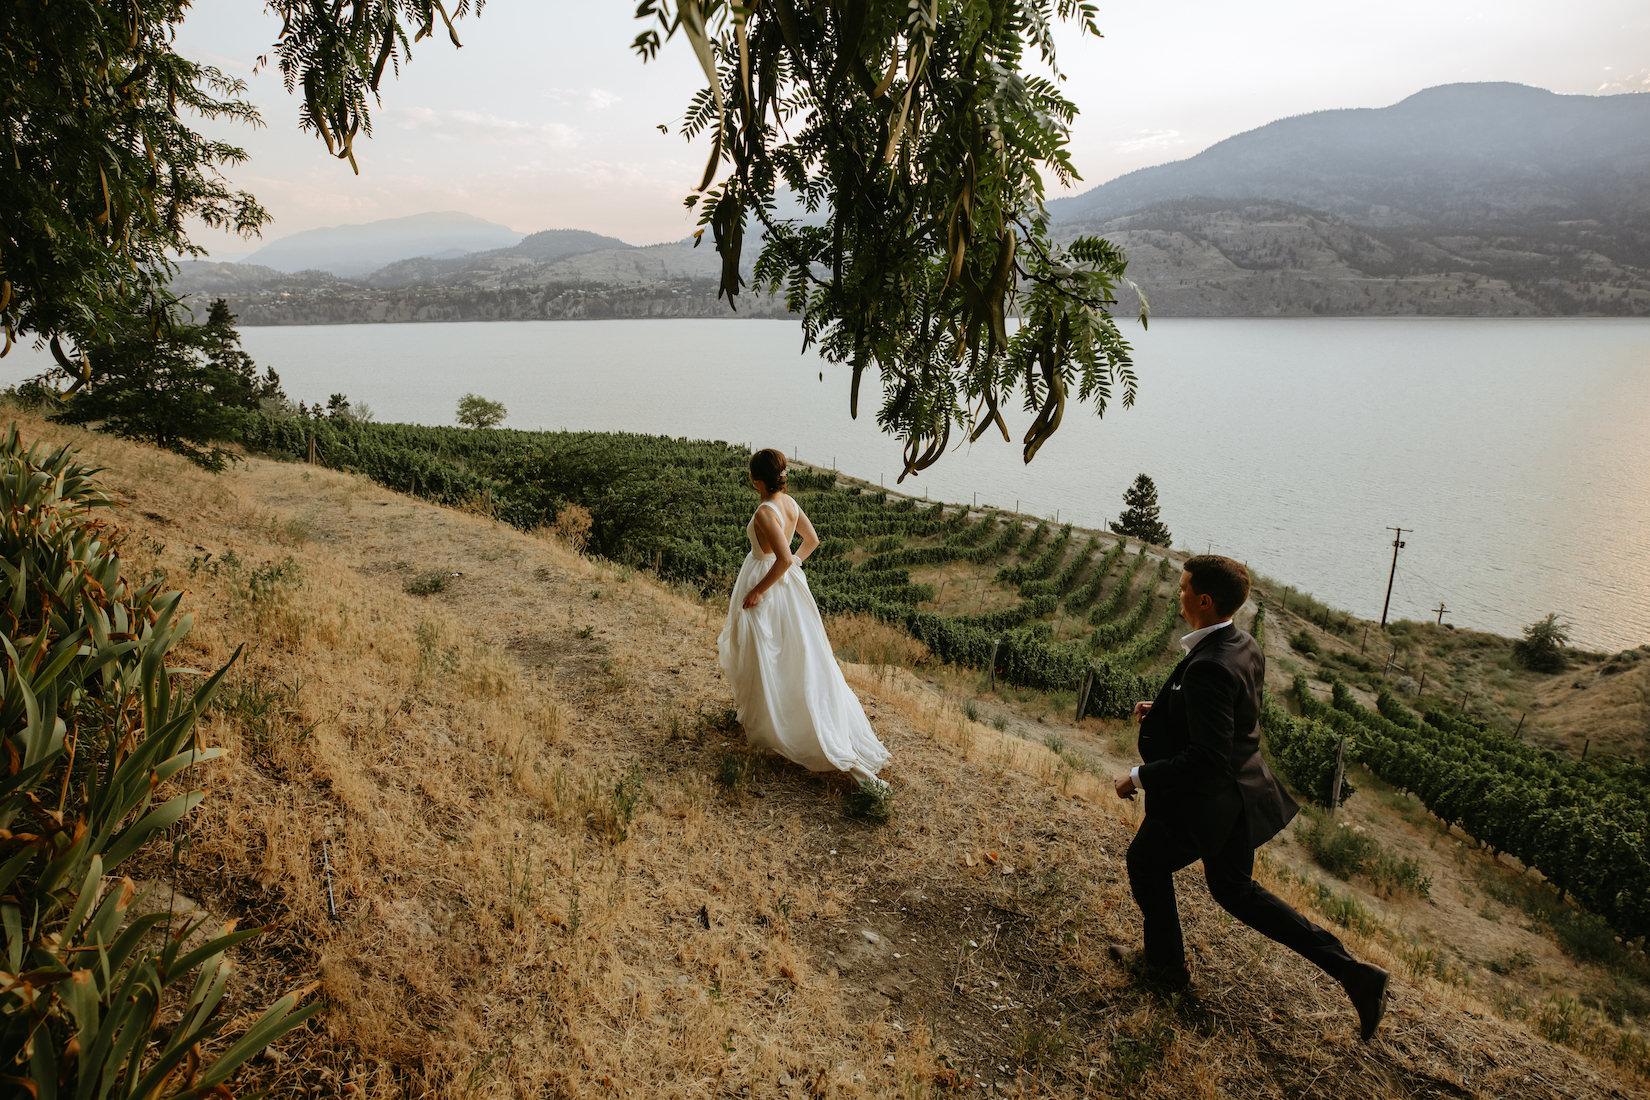 Gods-mountain-estate-weddings-42.jpg